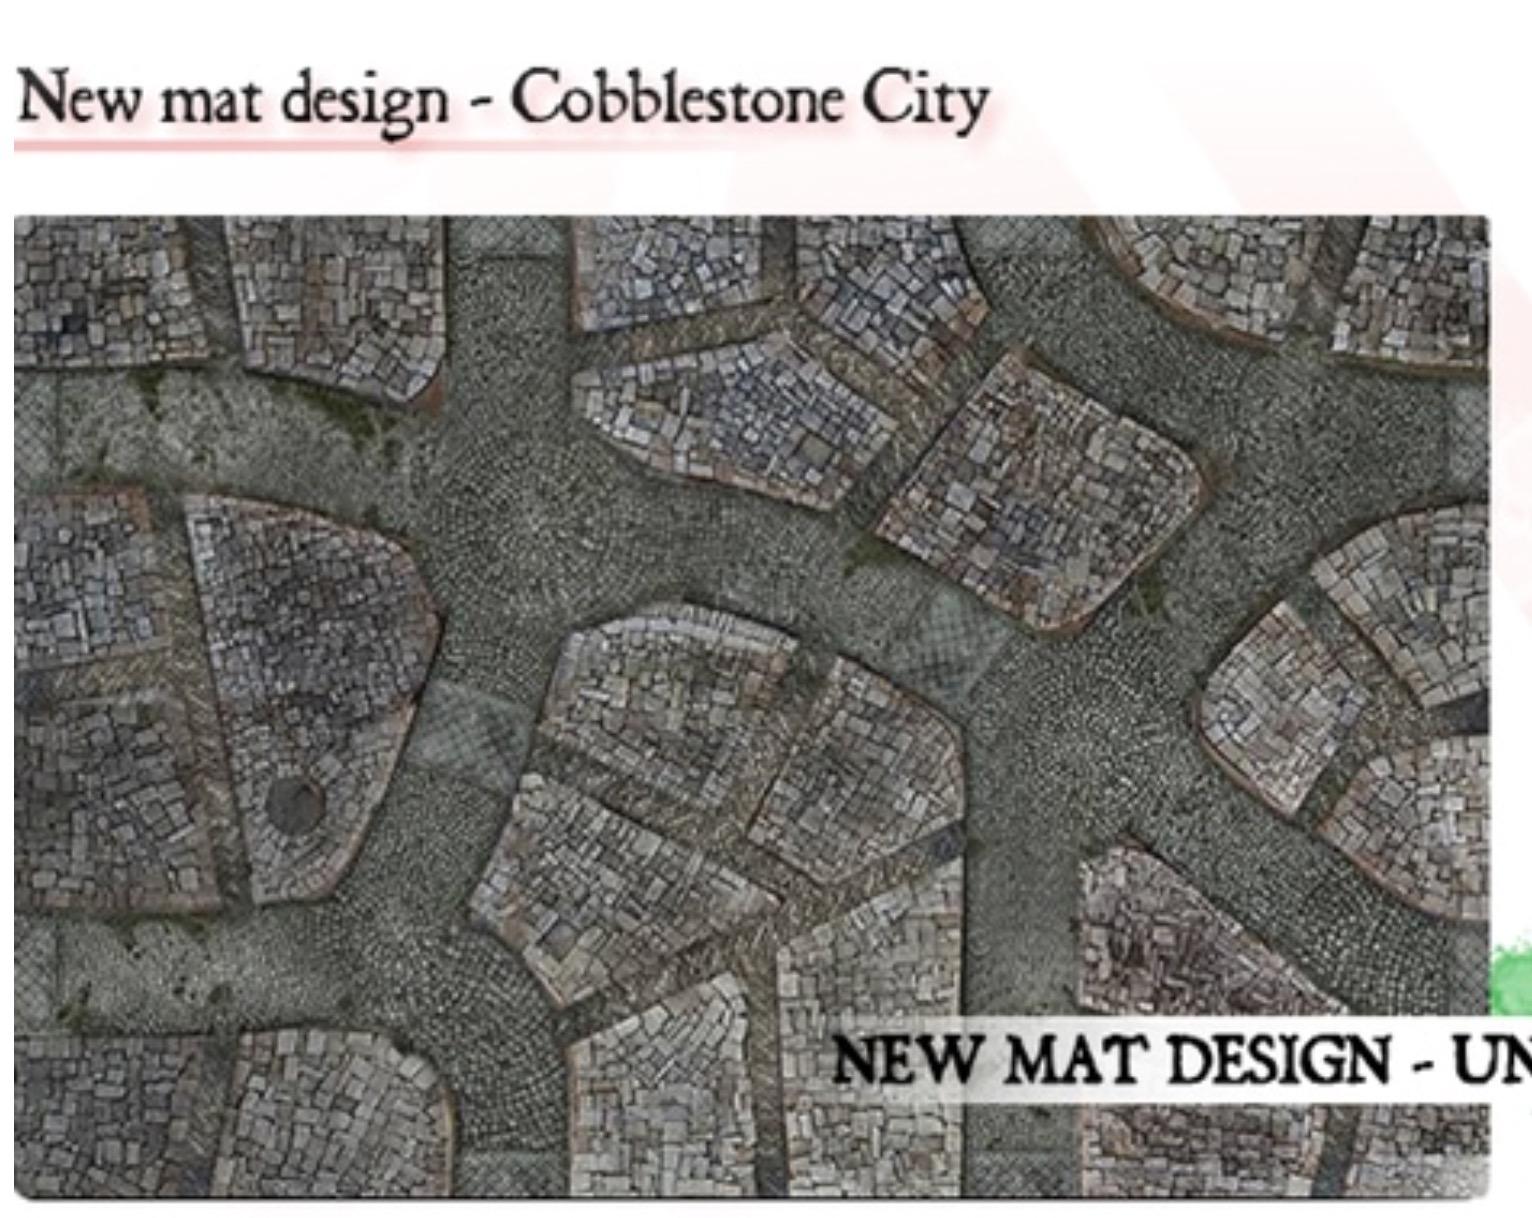 Kickstarter with excellent cobbl stone mat Image